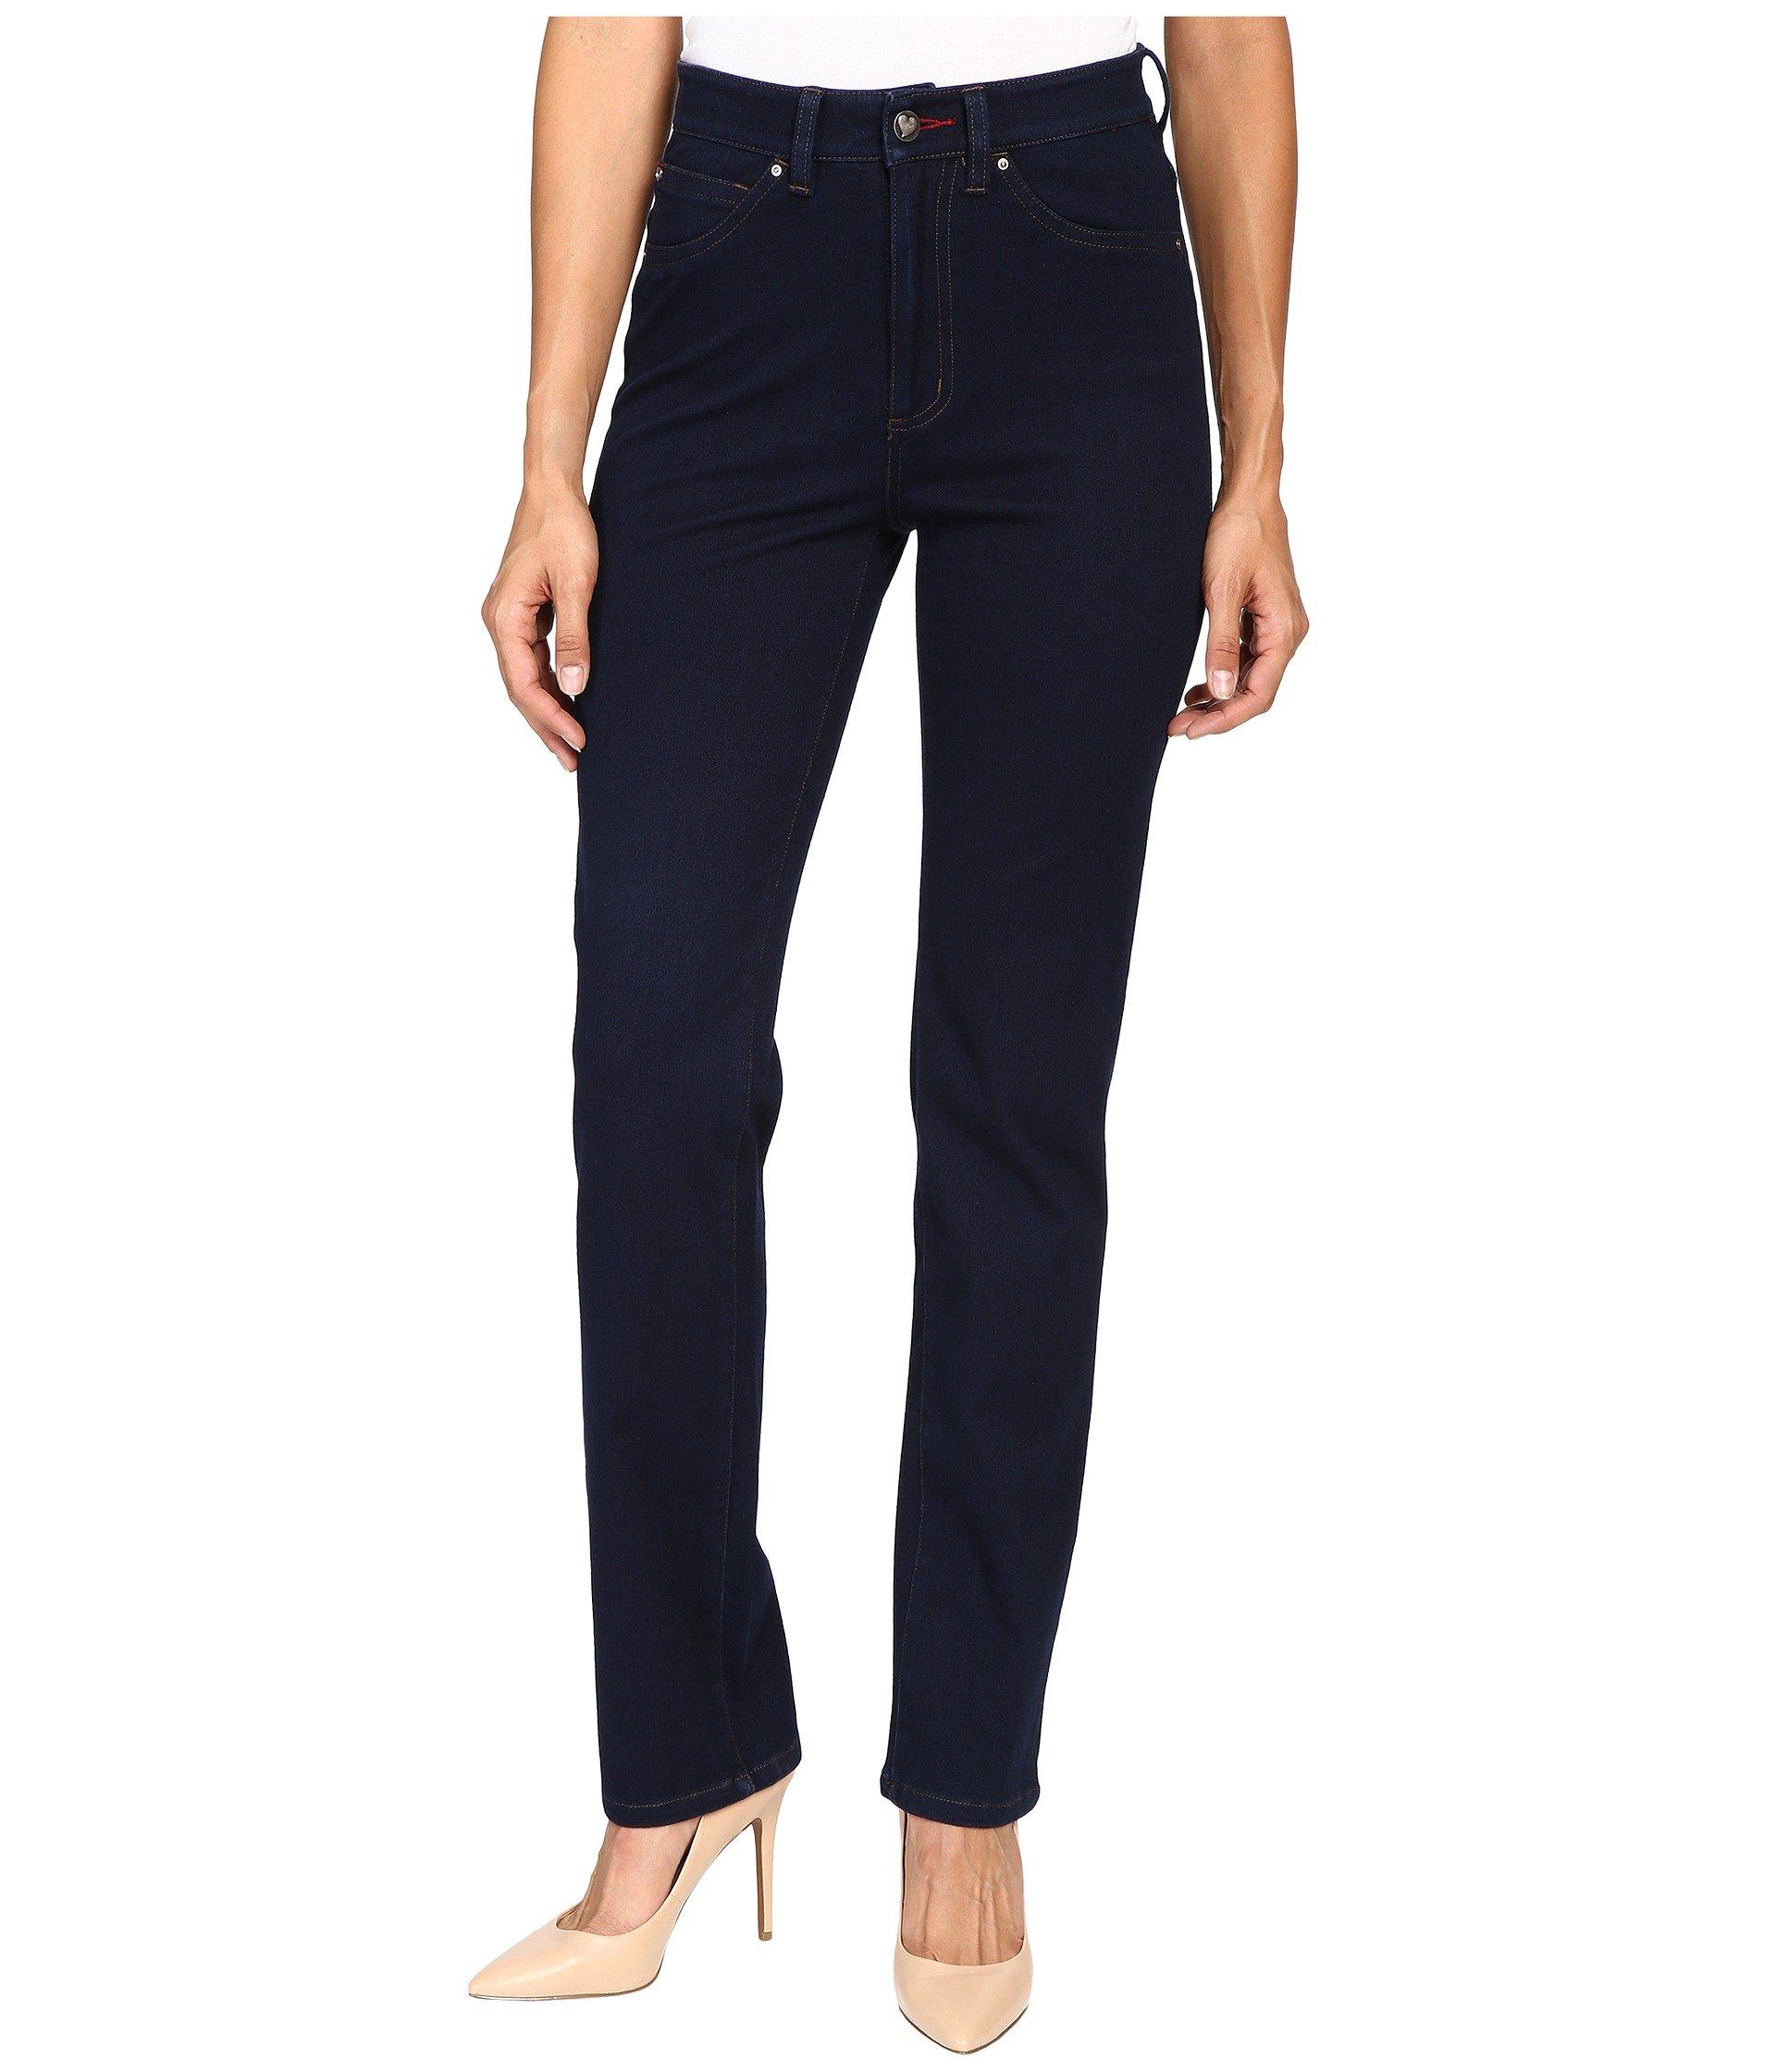 FDJ French Dressing Jeans Women's Suzanne Straight Leg/Love Denim in Indigo Indigo Jeans